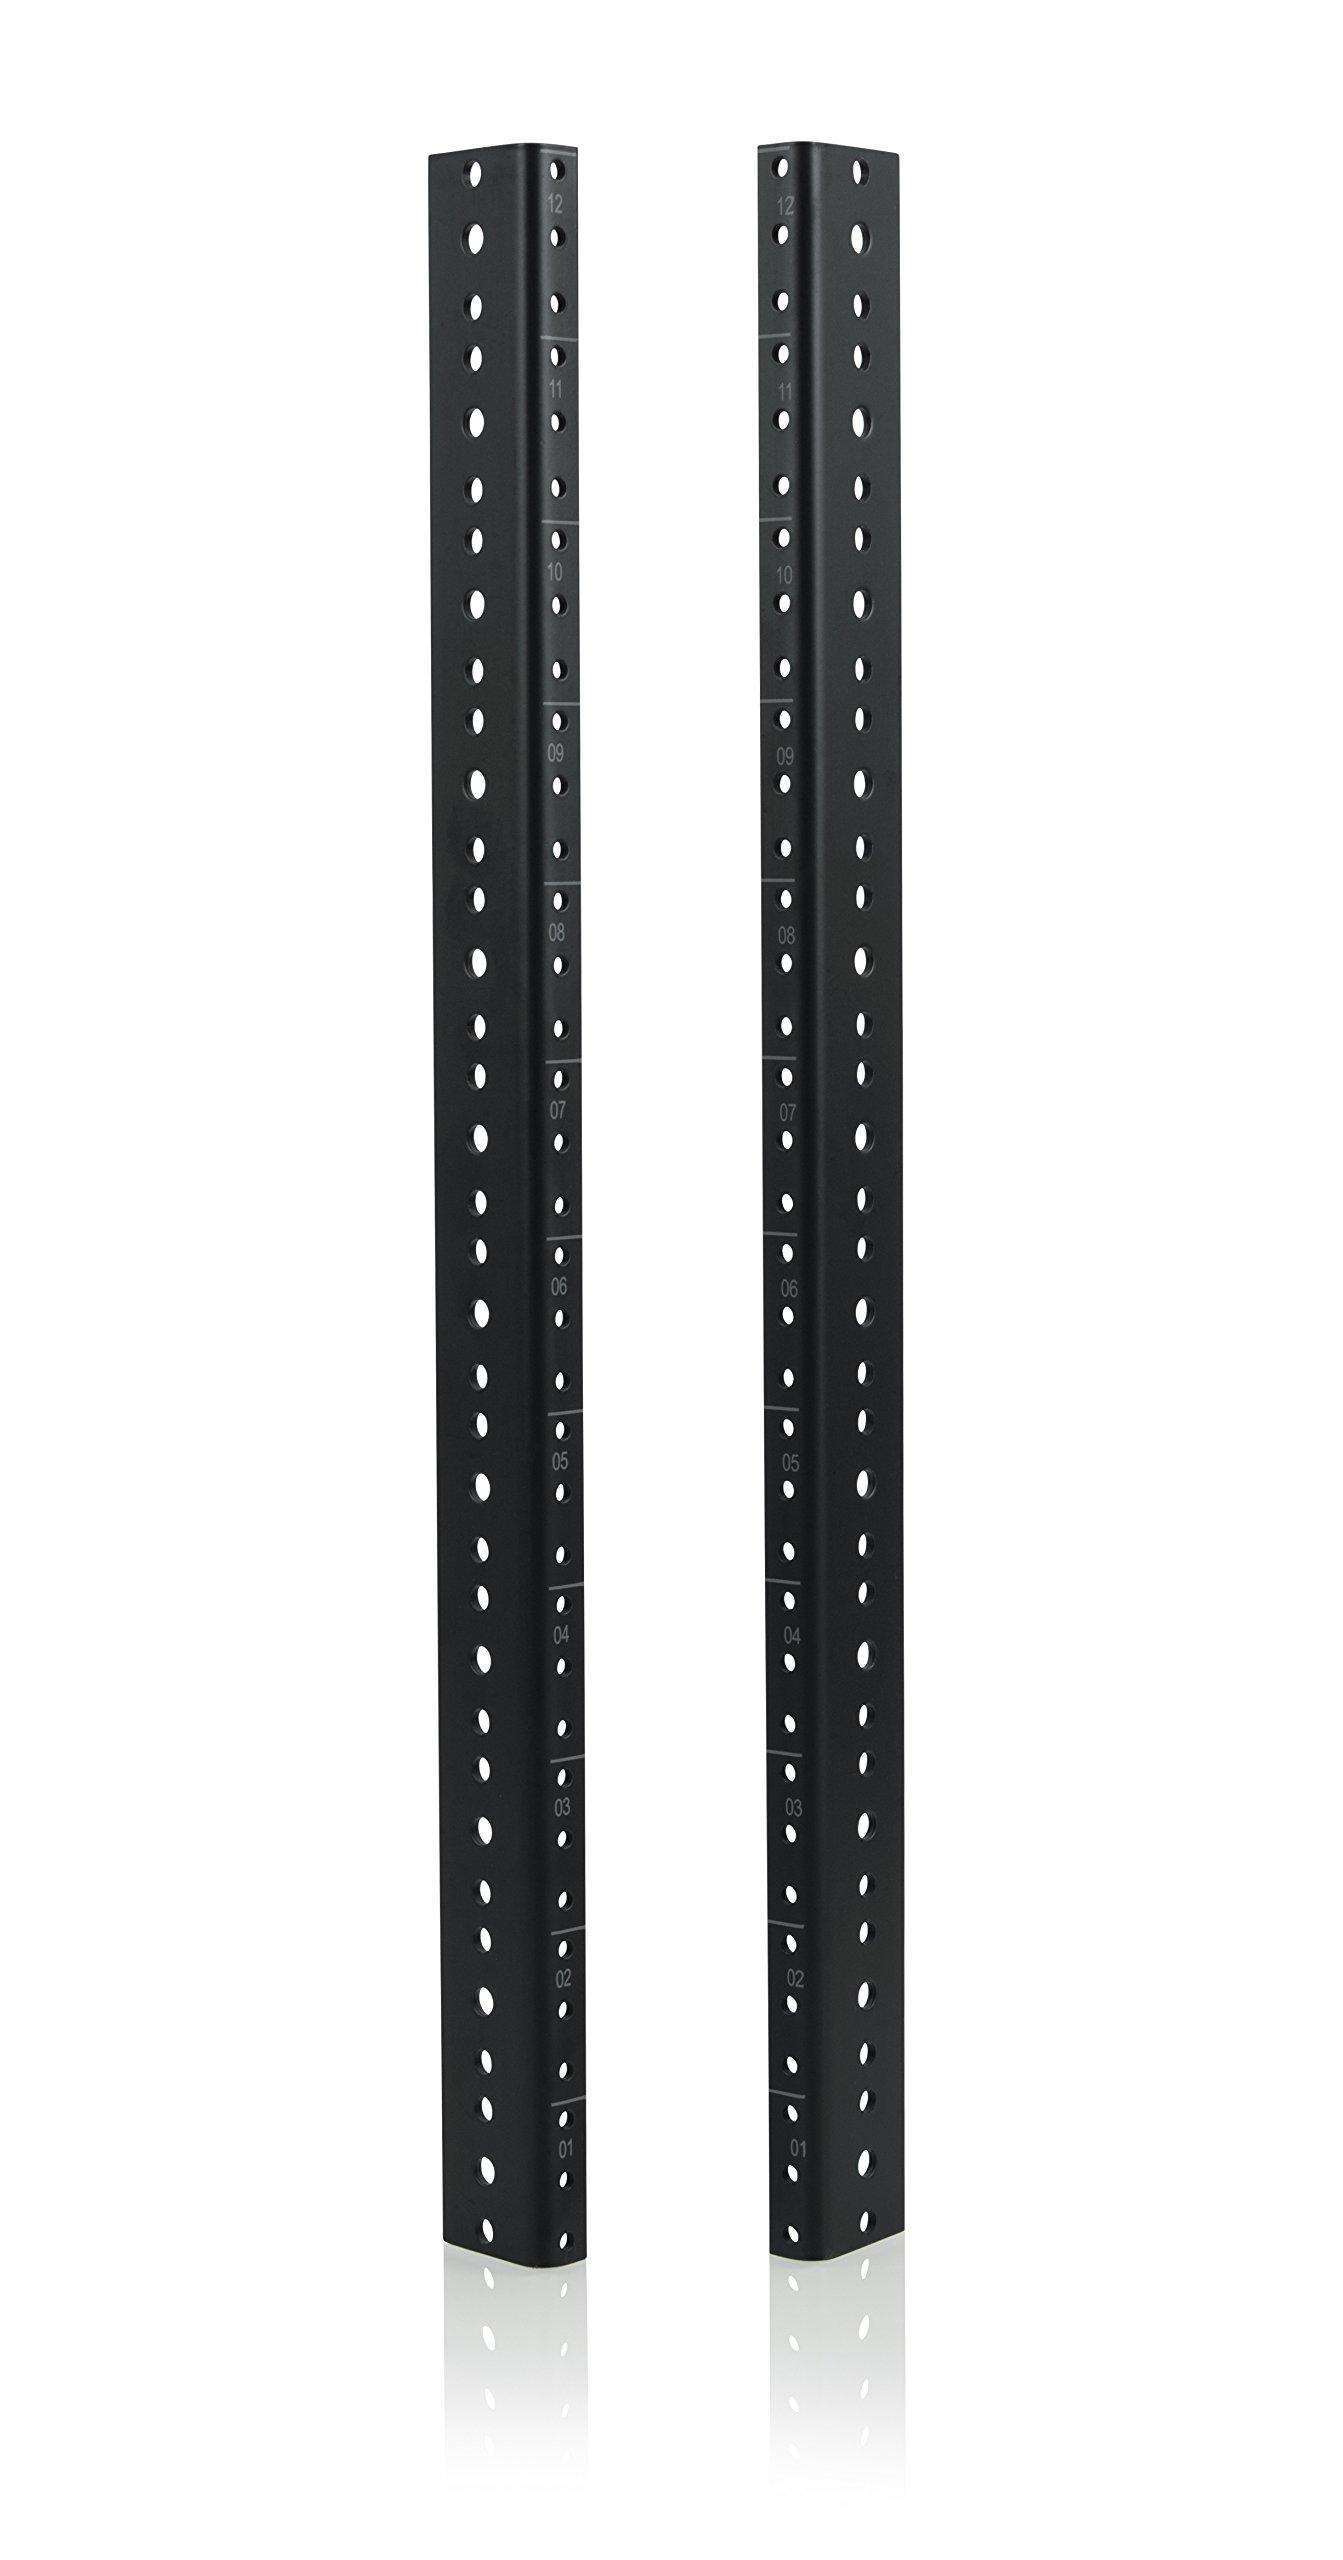 Gator Rackworks Heavy Duty Steel Rack Rail Set; 12U Rack Size (GRW-RACKRAIL-12U)